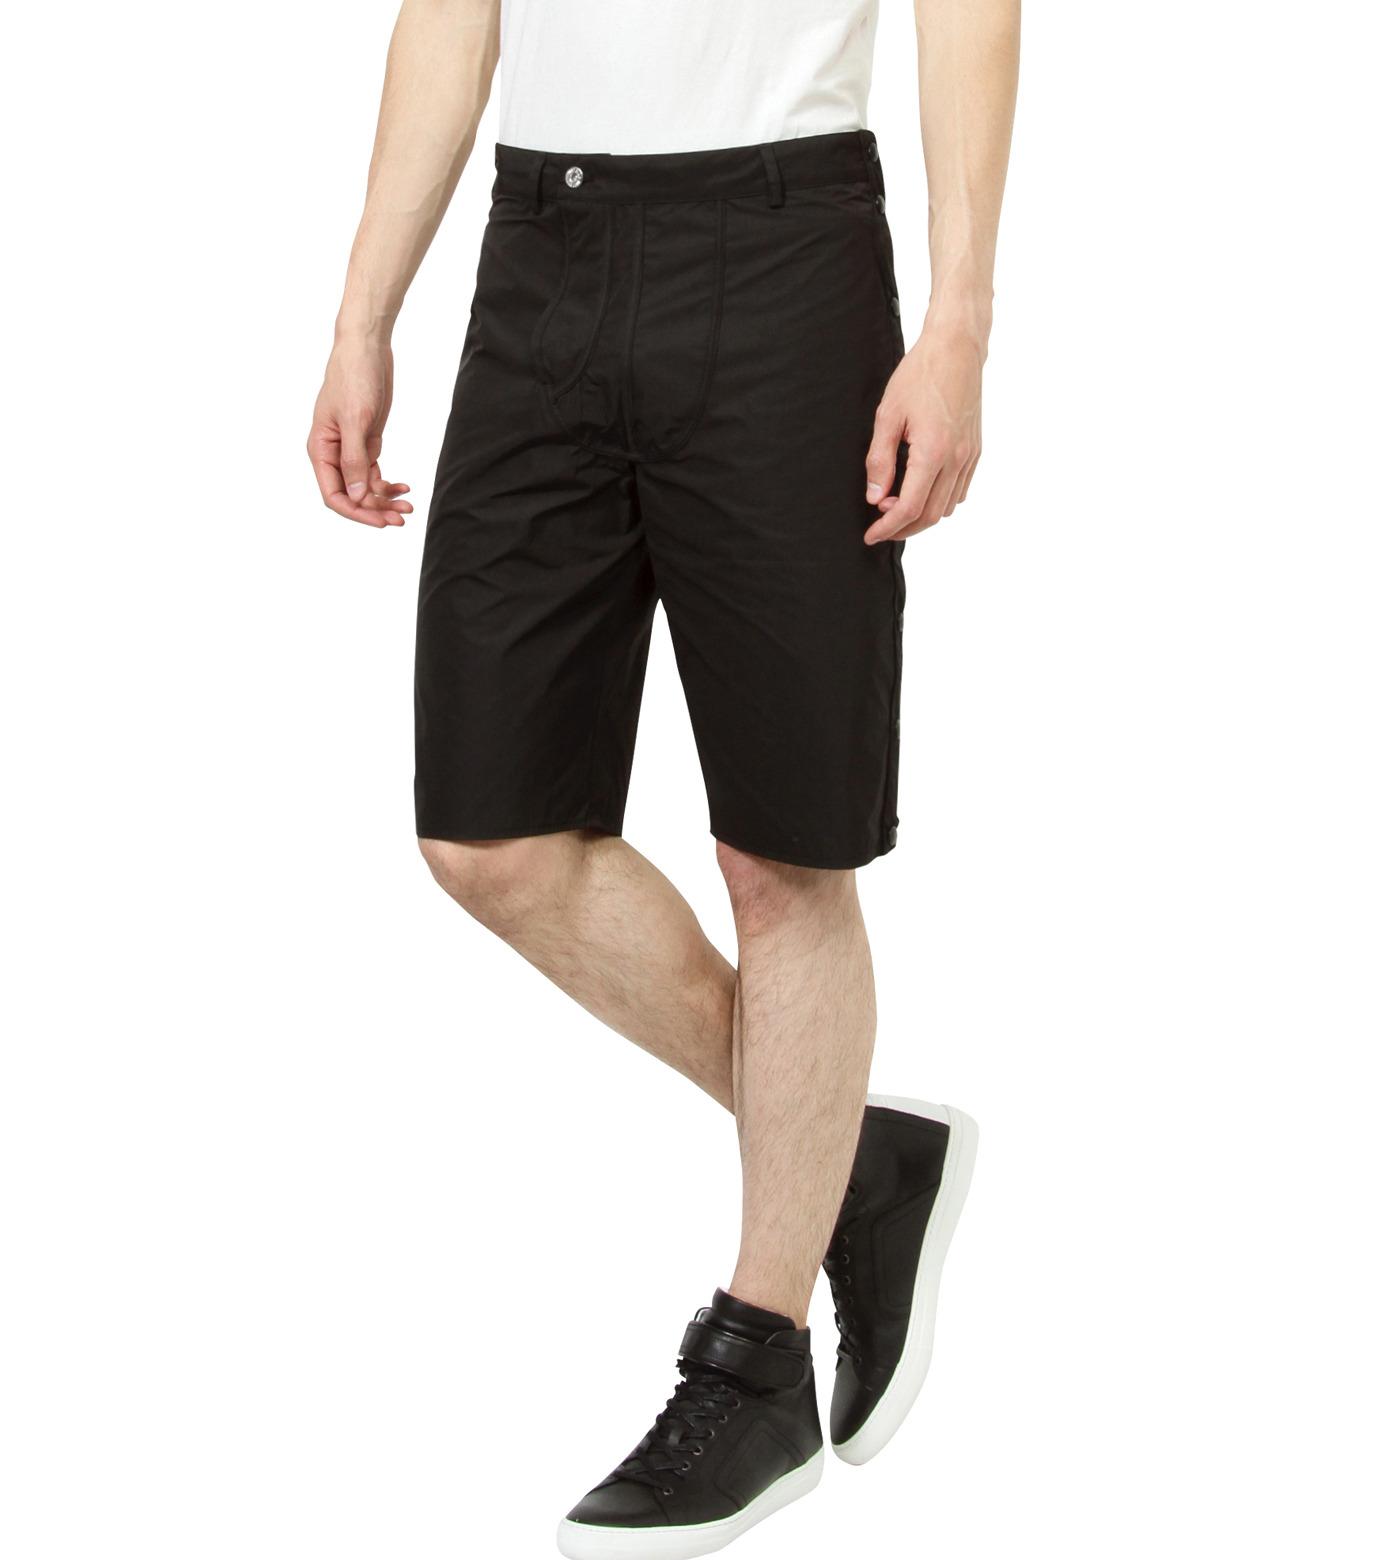 Hood By Air(フード・バイ・エアー)のTrack Snap Short w/Underwear Fly-BLACK(パンツ/pants)-S15-WS46-A-13 拡大詳細画像3